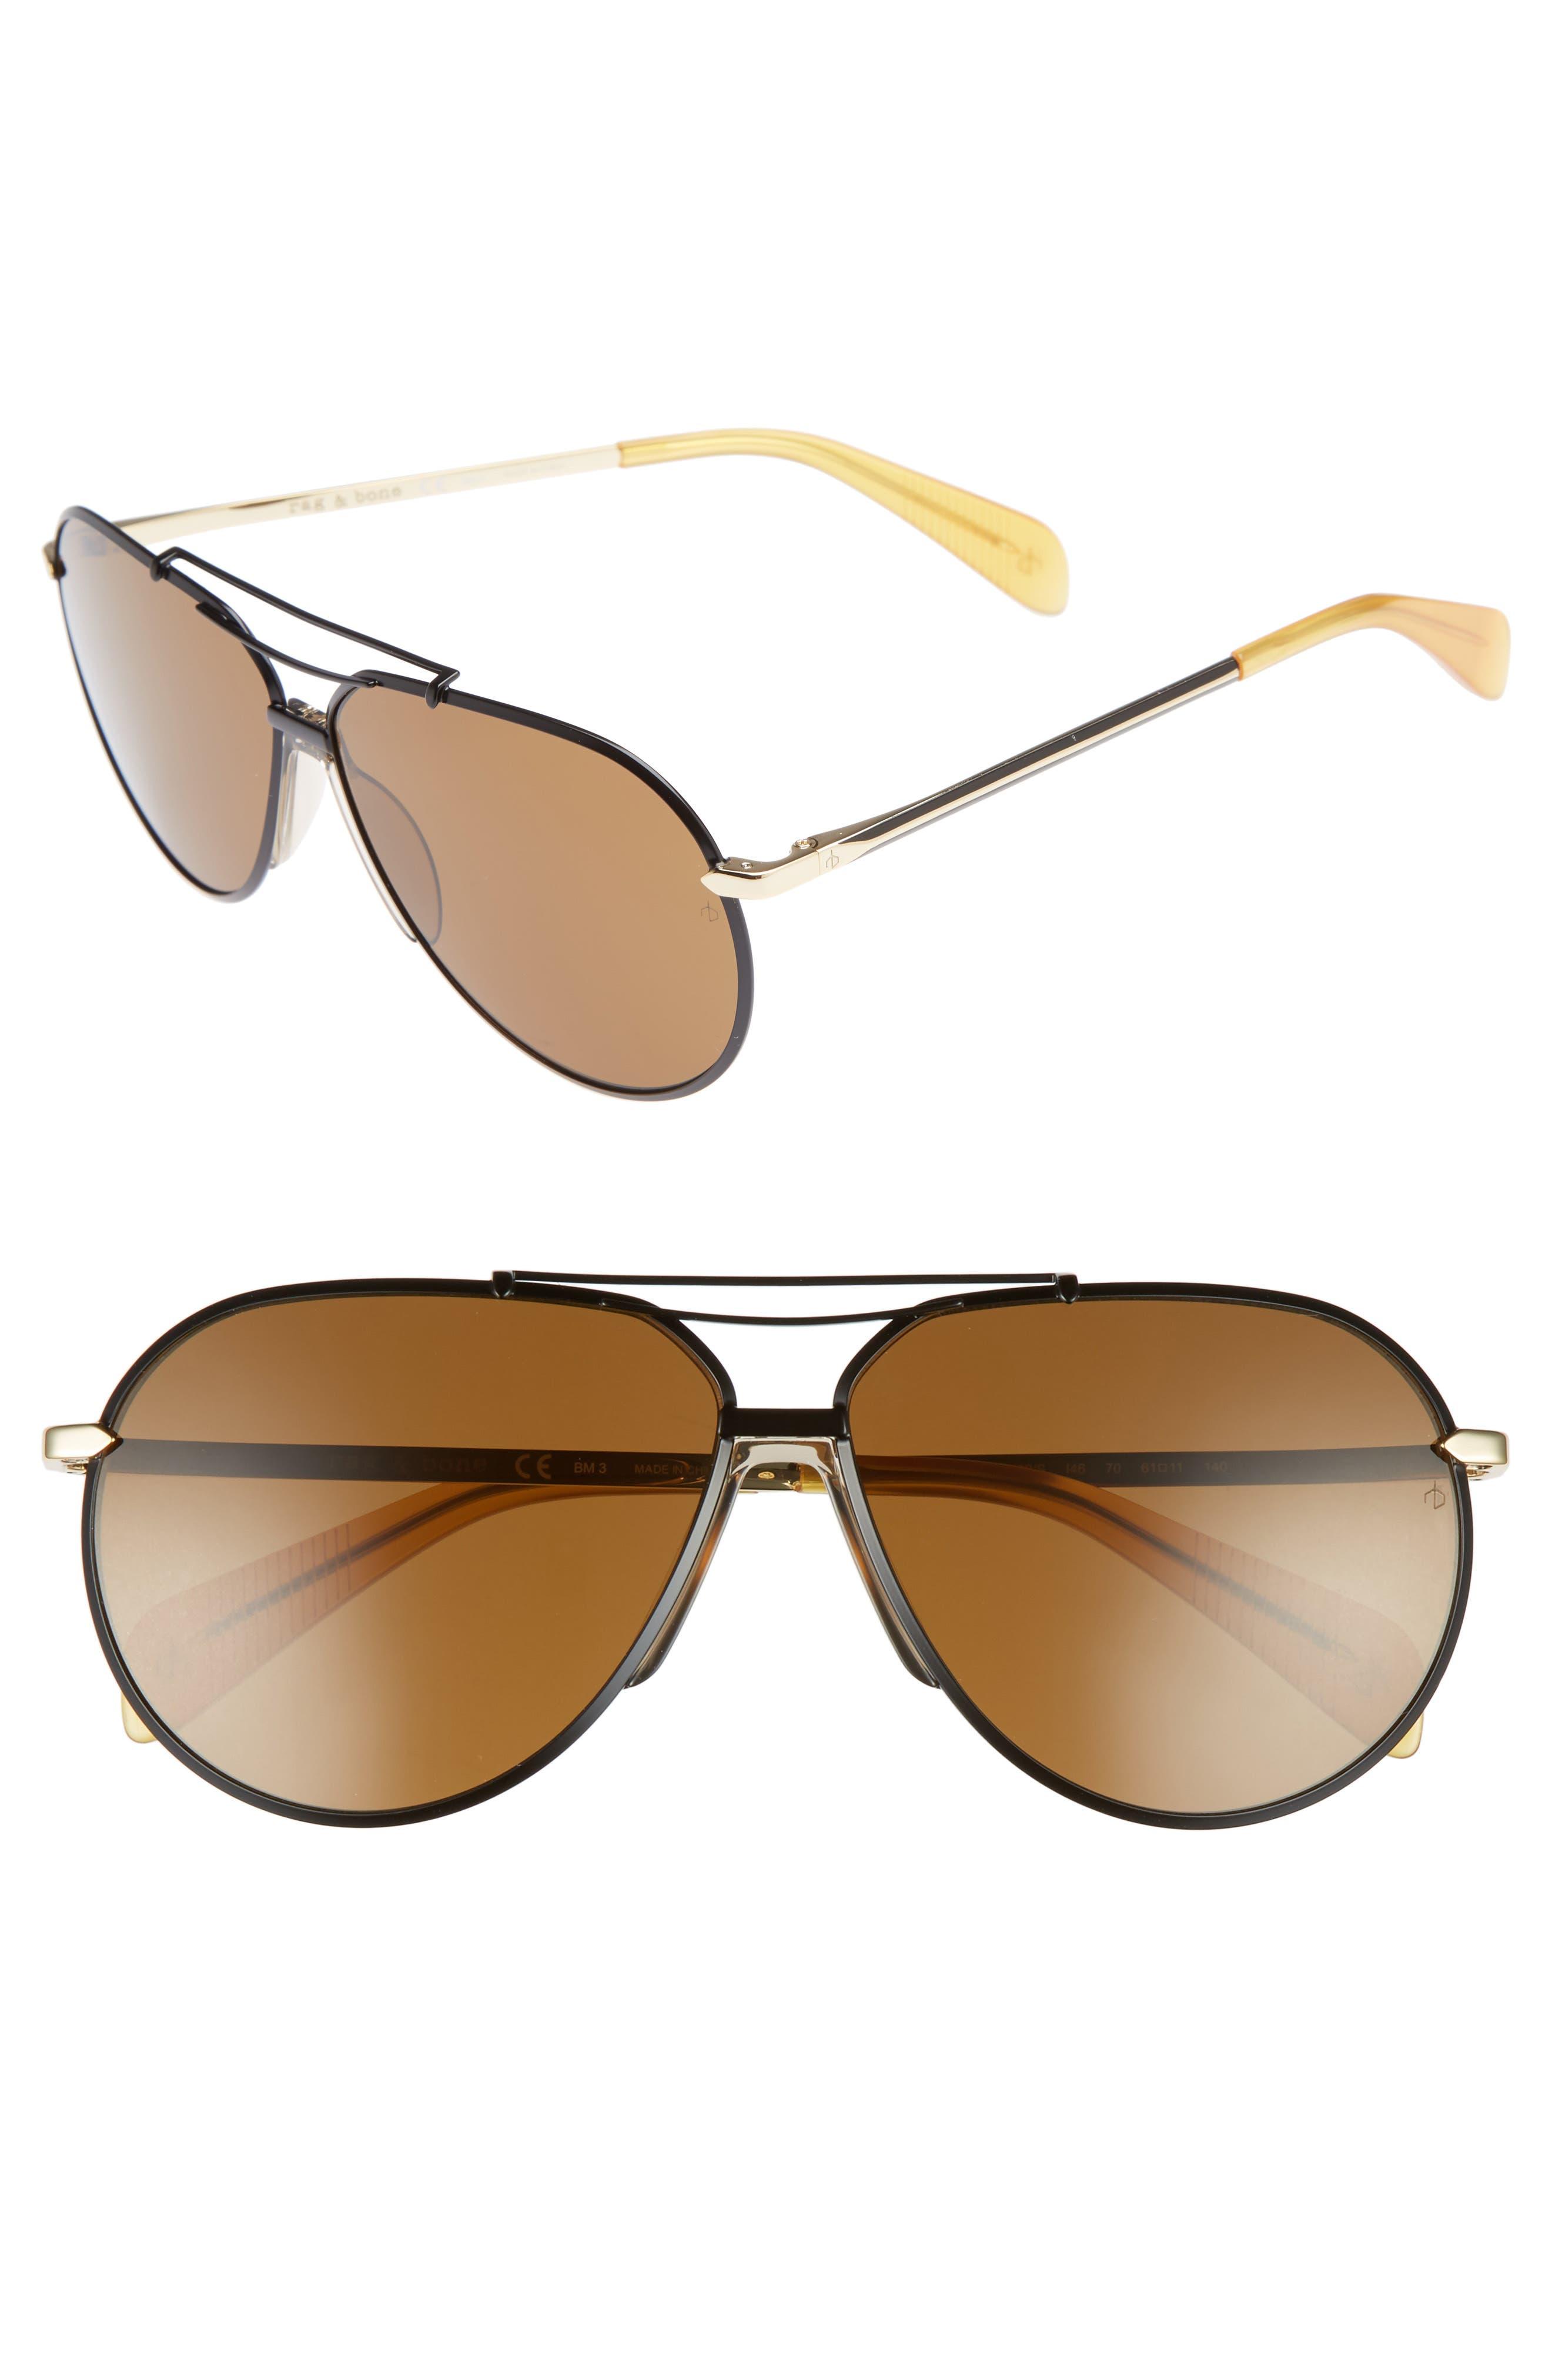 61mm Aviator Sunglasses,                         Main,                         color, Black Gold